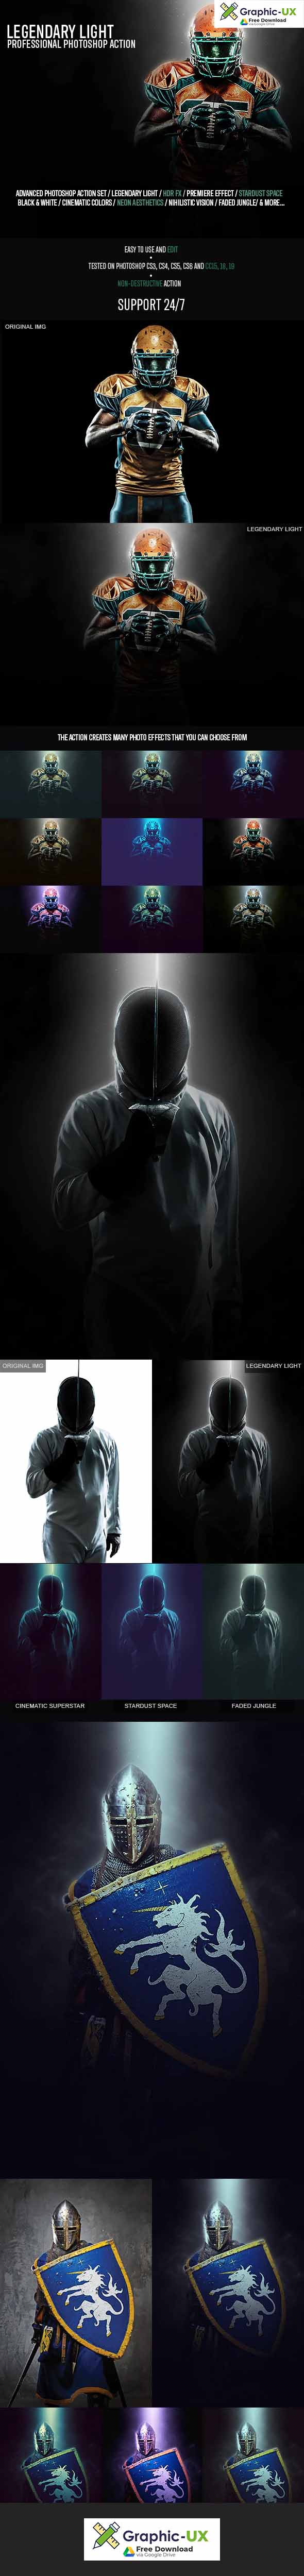 Legendary Light Photoshop Action